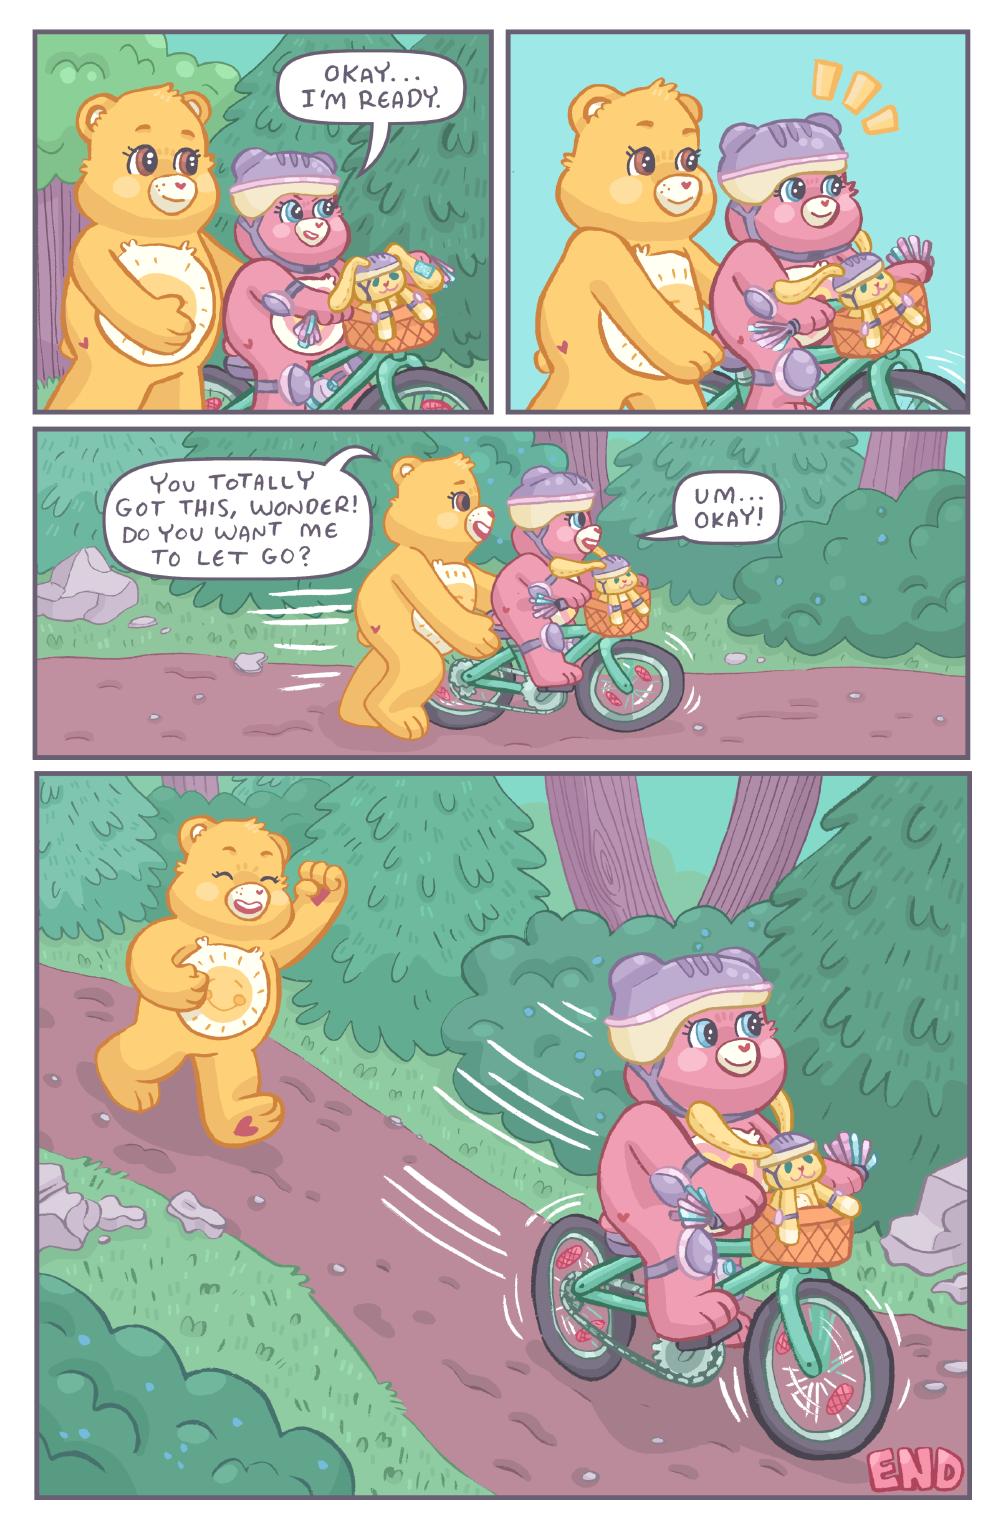 cb-bike-4.png